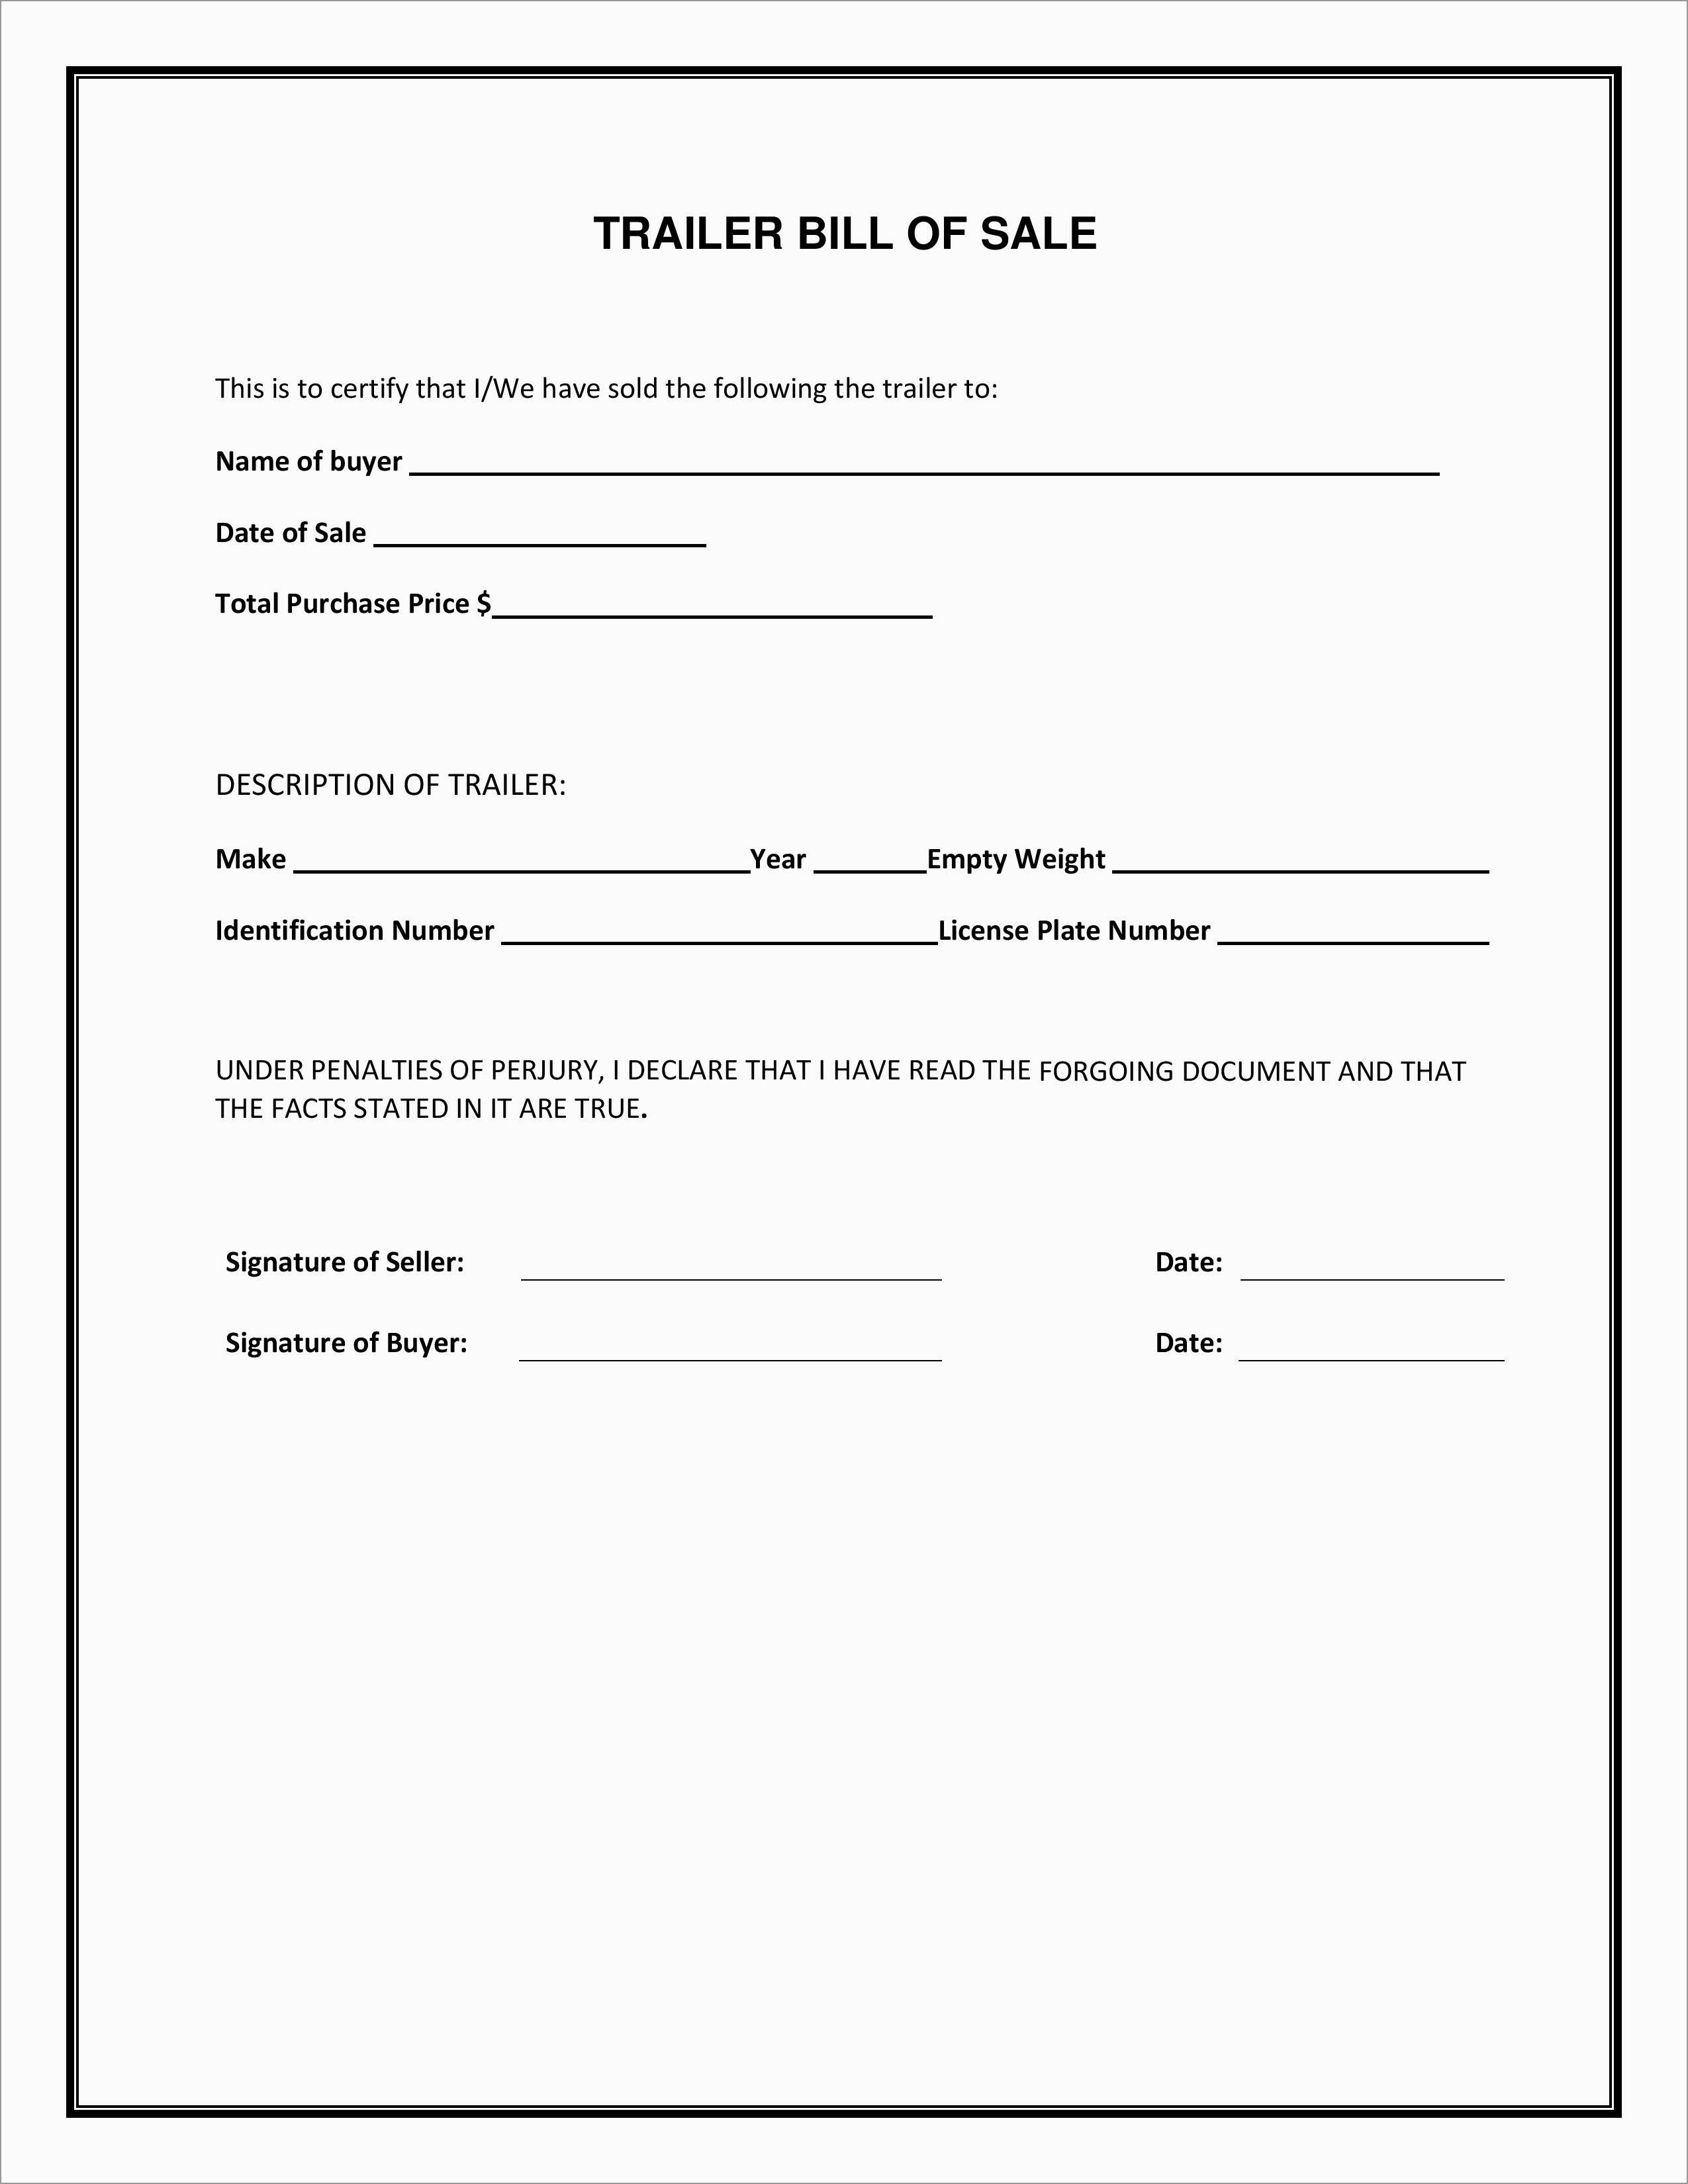 Beautiful Bill Of Sale Free Template Form | Best Of Template - Free Printable Bill Of Sale